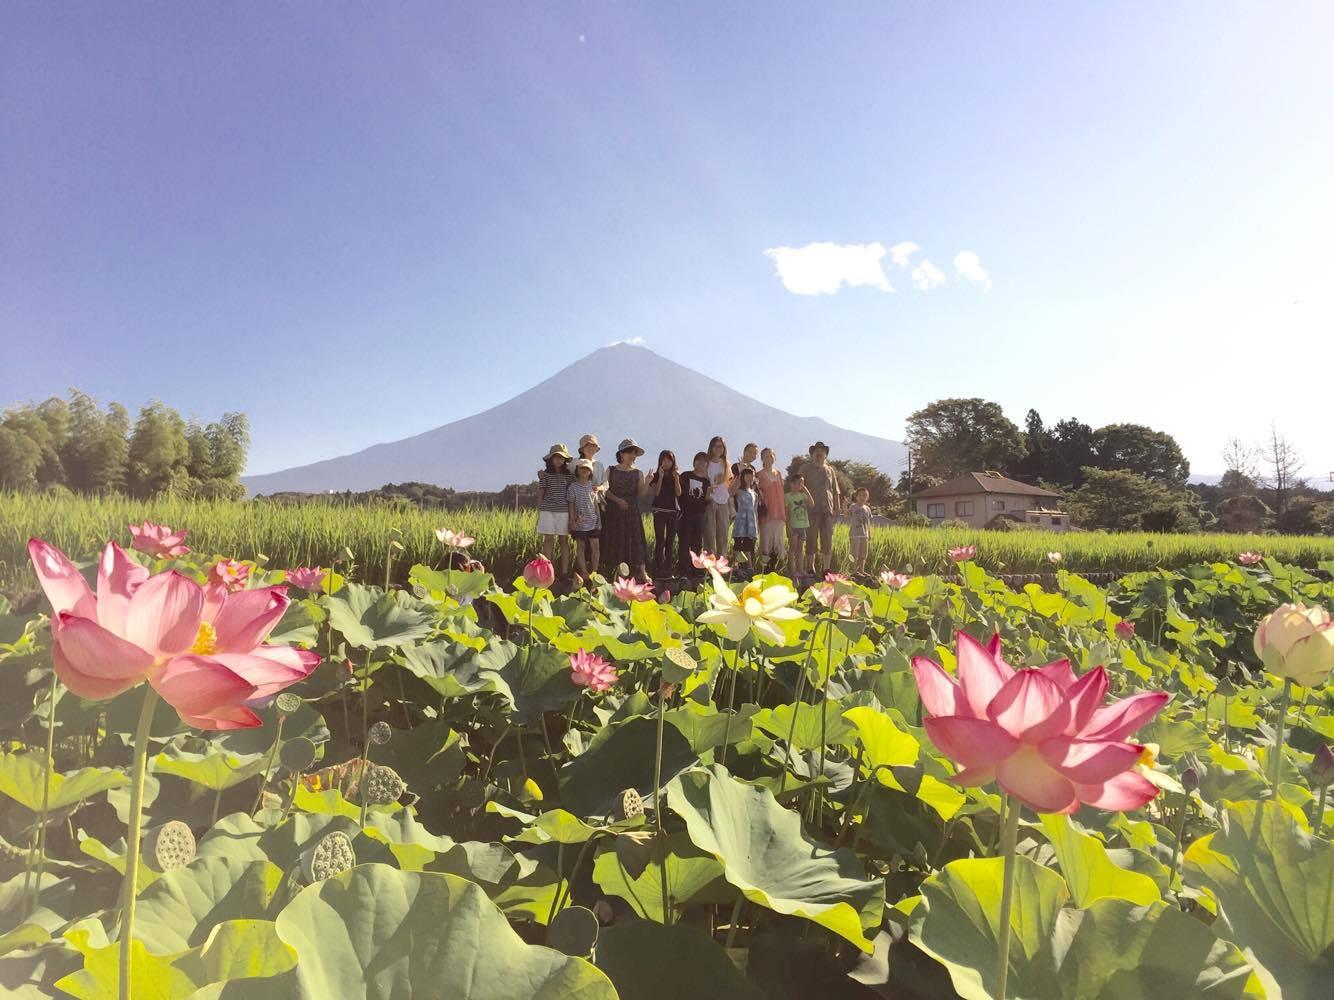 Mt. Fuji, Lotus flowers and people